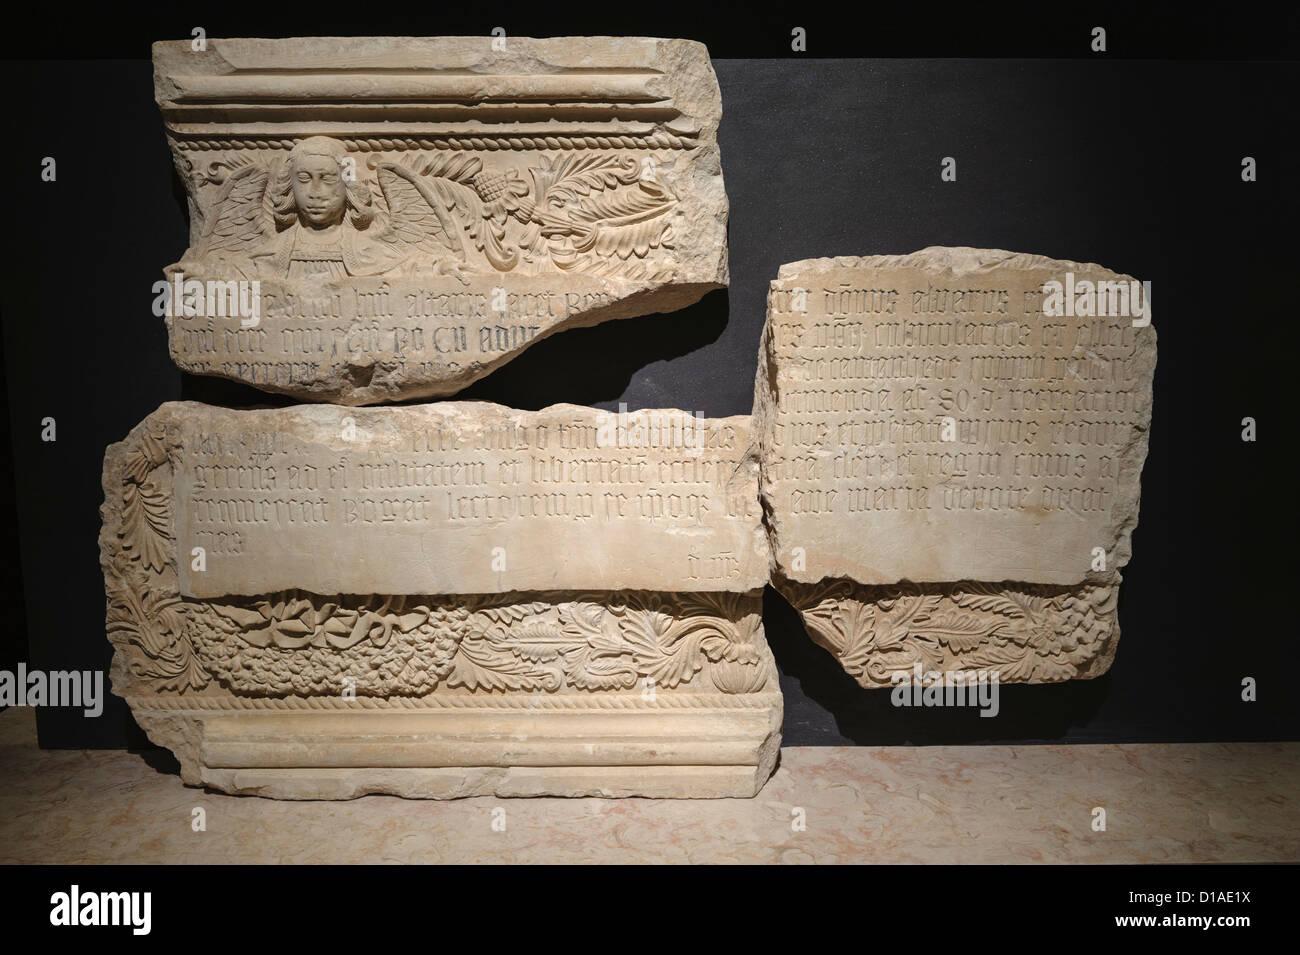 Ancient latin writings on stone - Stock Image